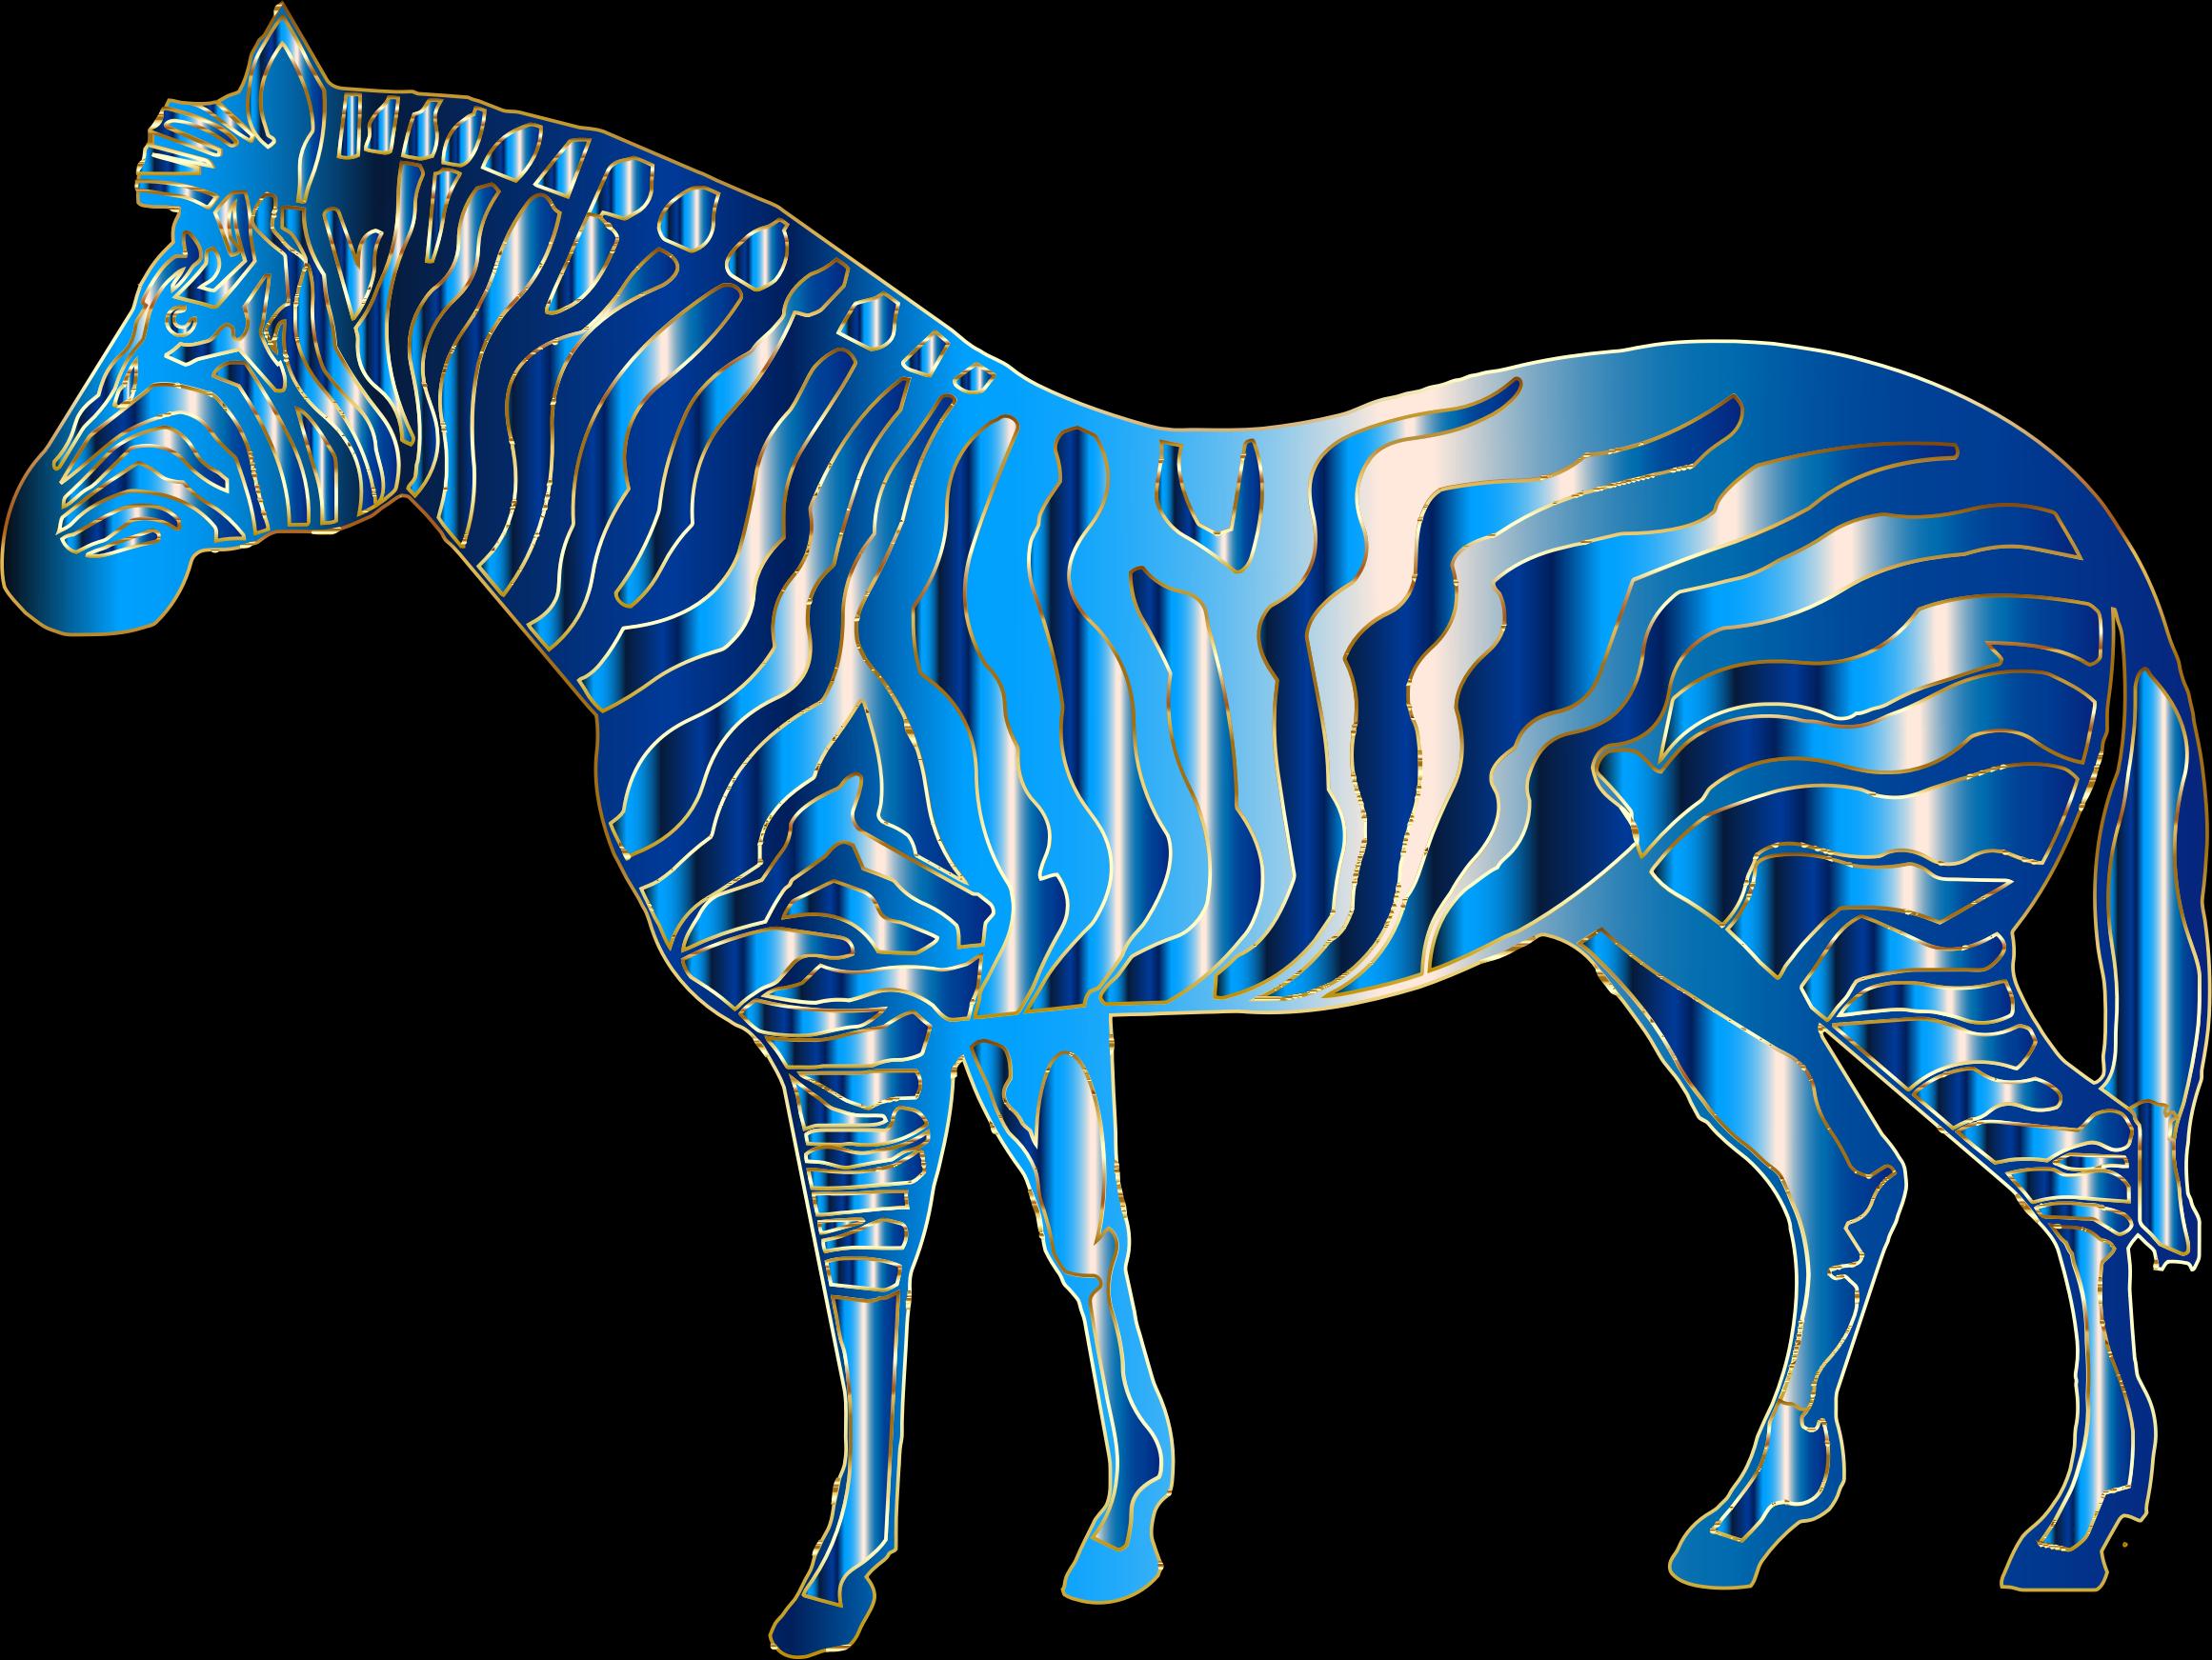 Clipart zebra family. Aquamarine icons png free